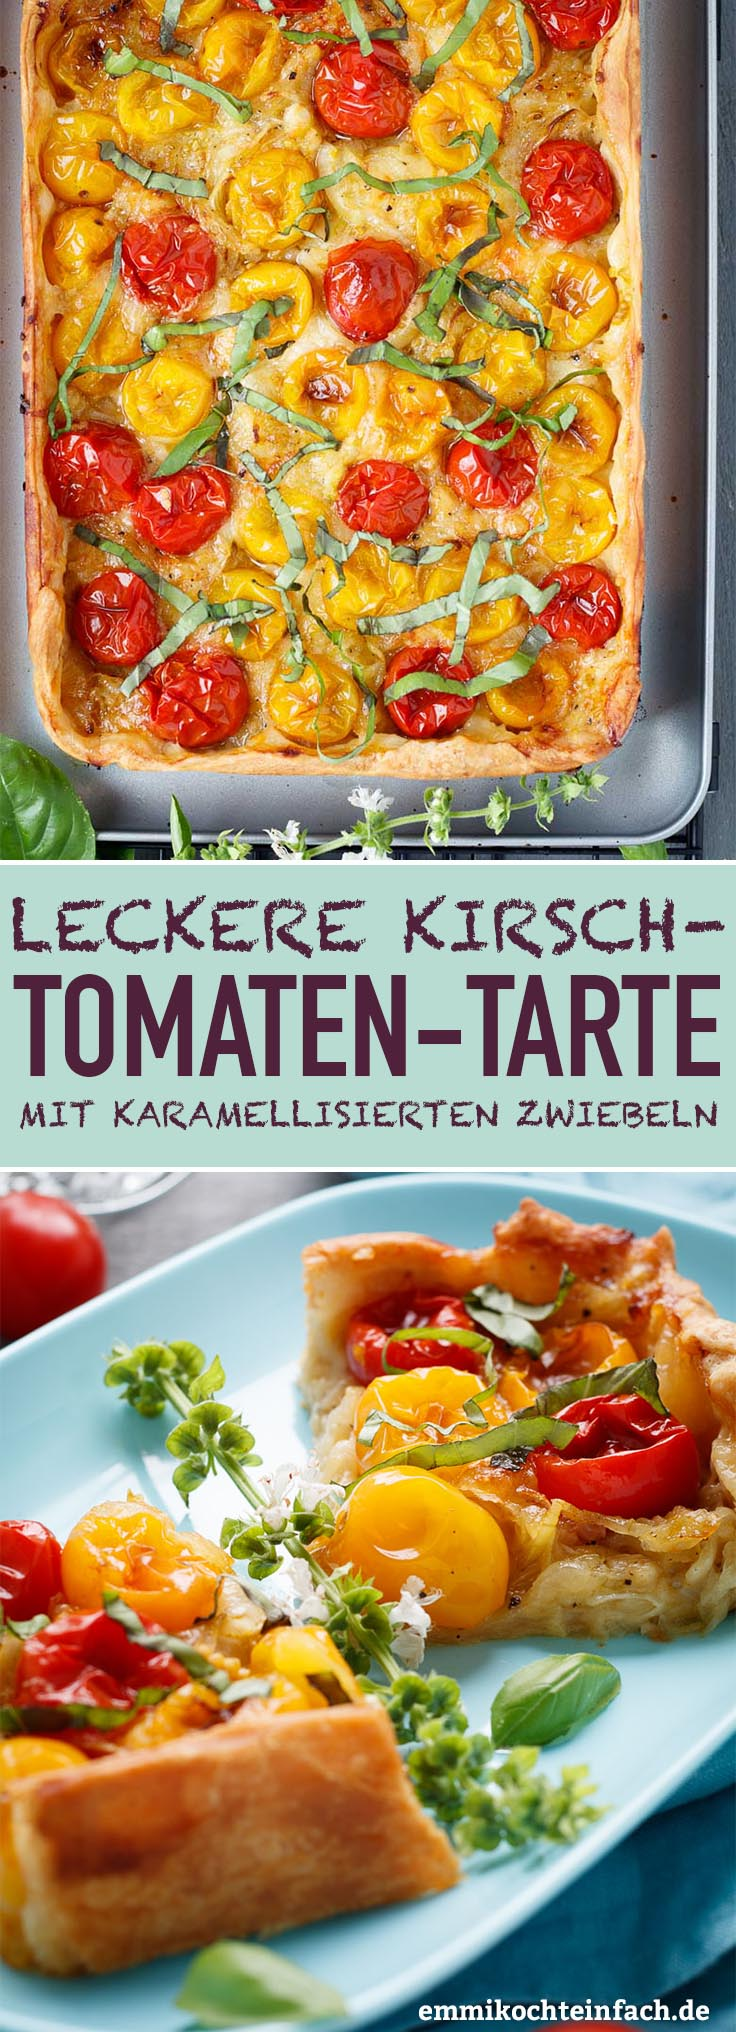 Kirschtomaten Tarte - www.emmikochteinfach.de